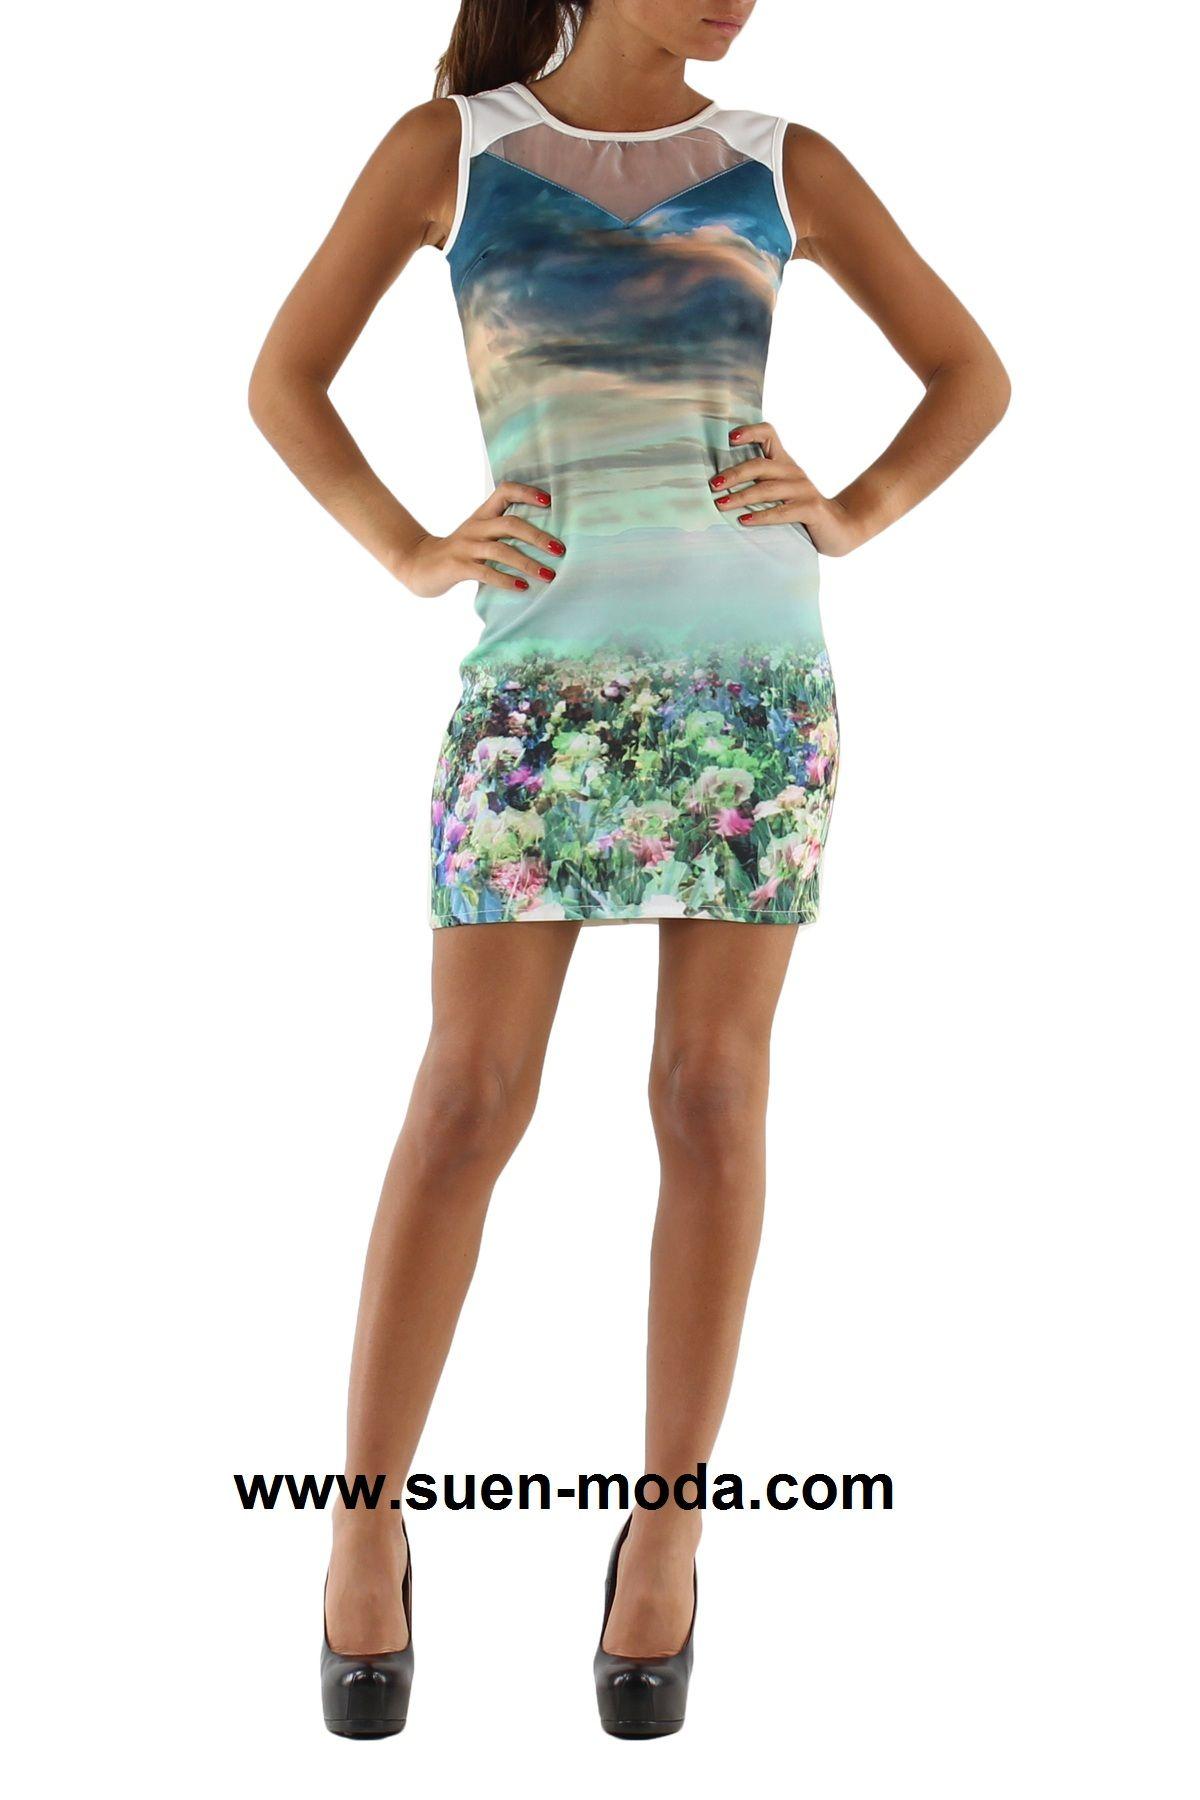 www.suenmoda.com Vestido estampado paisaje